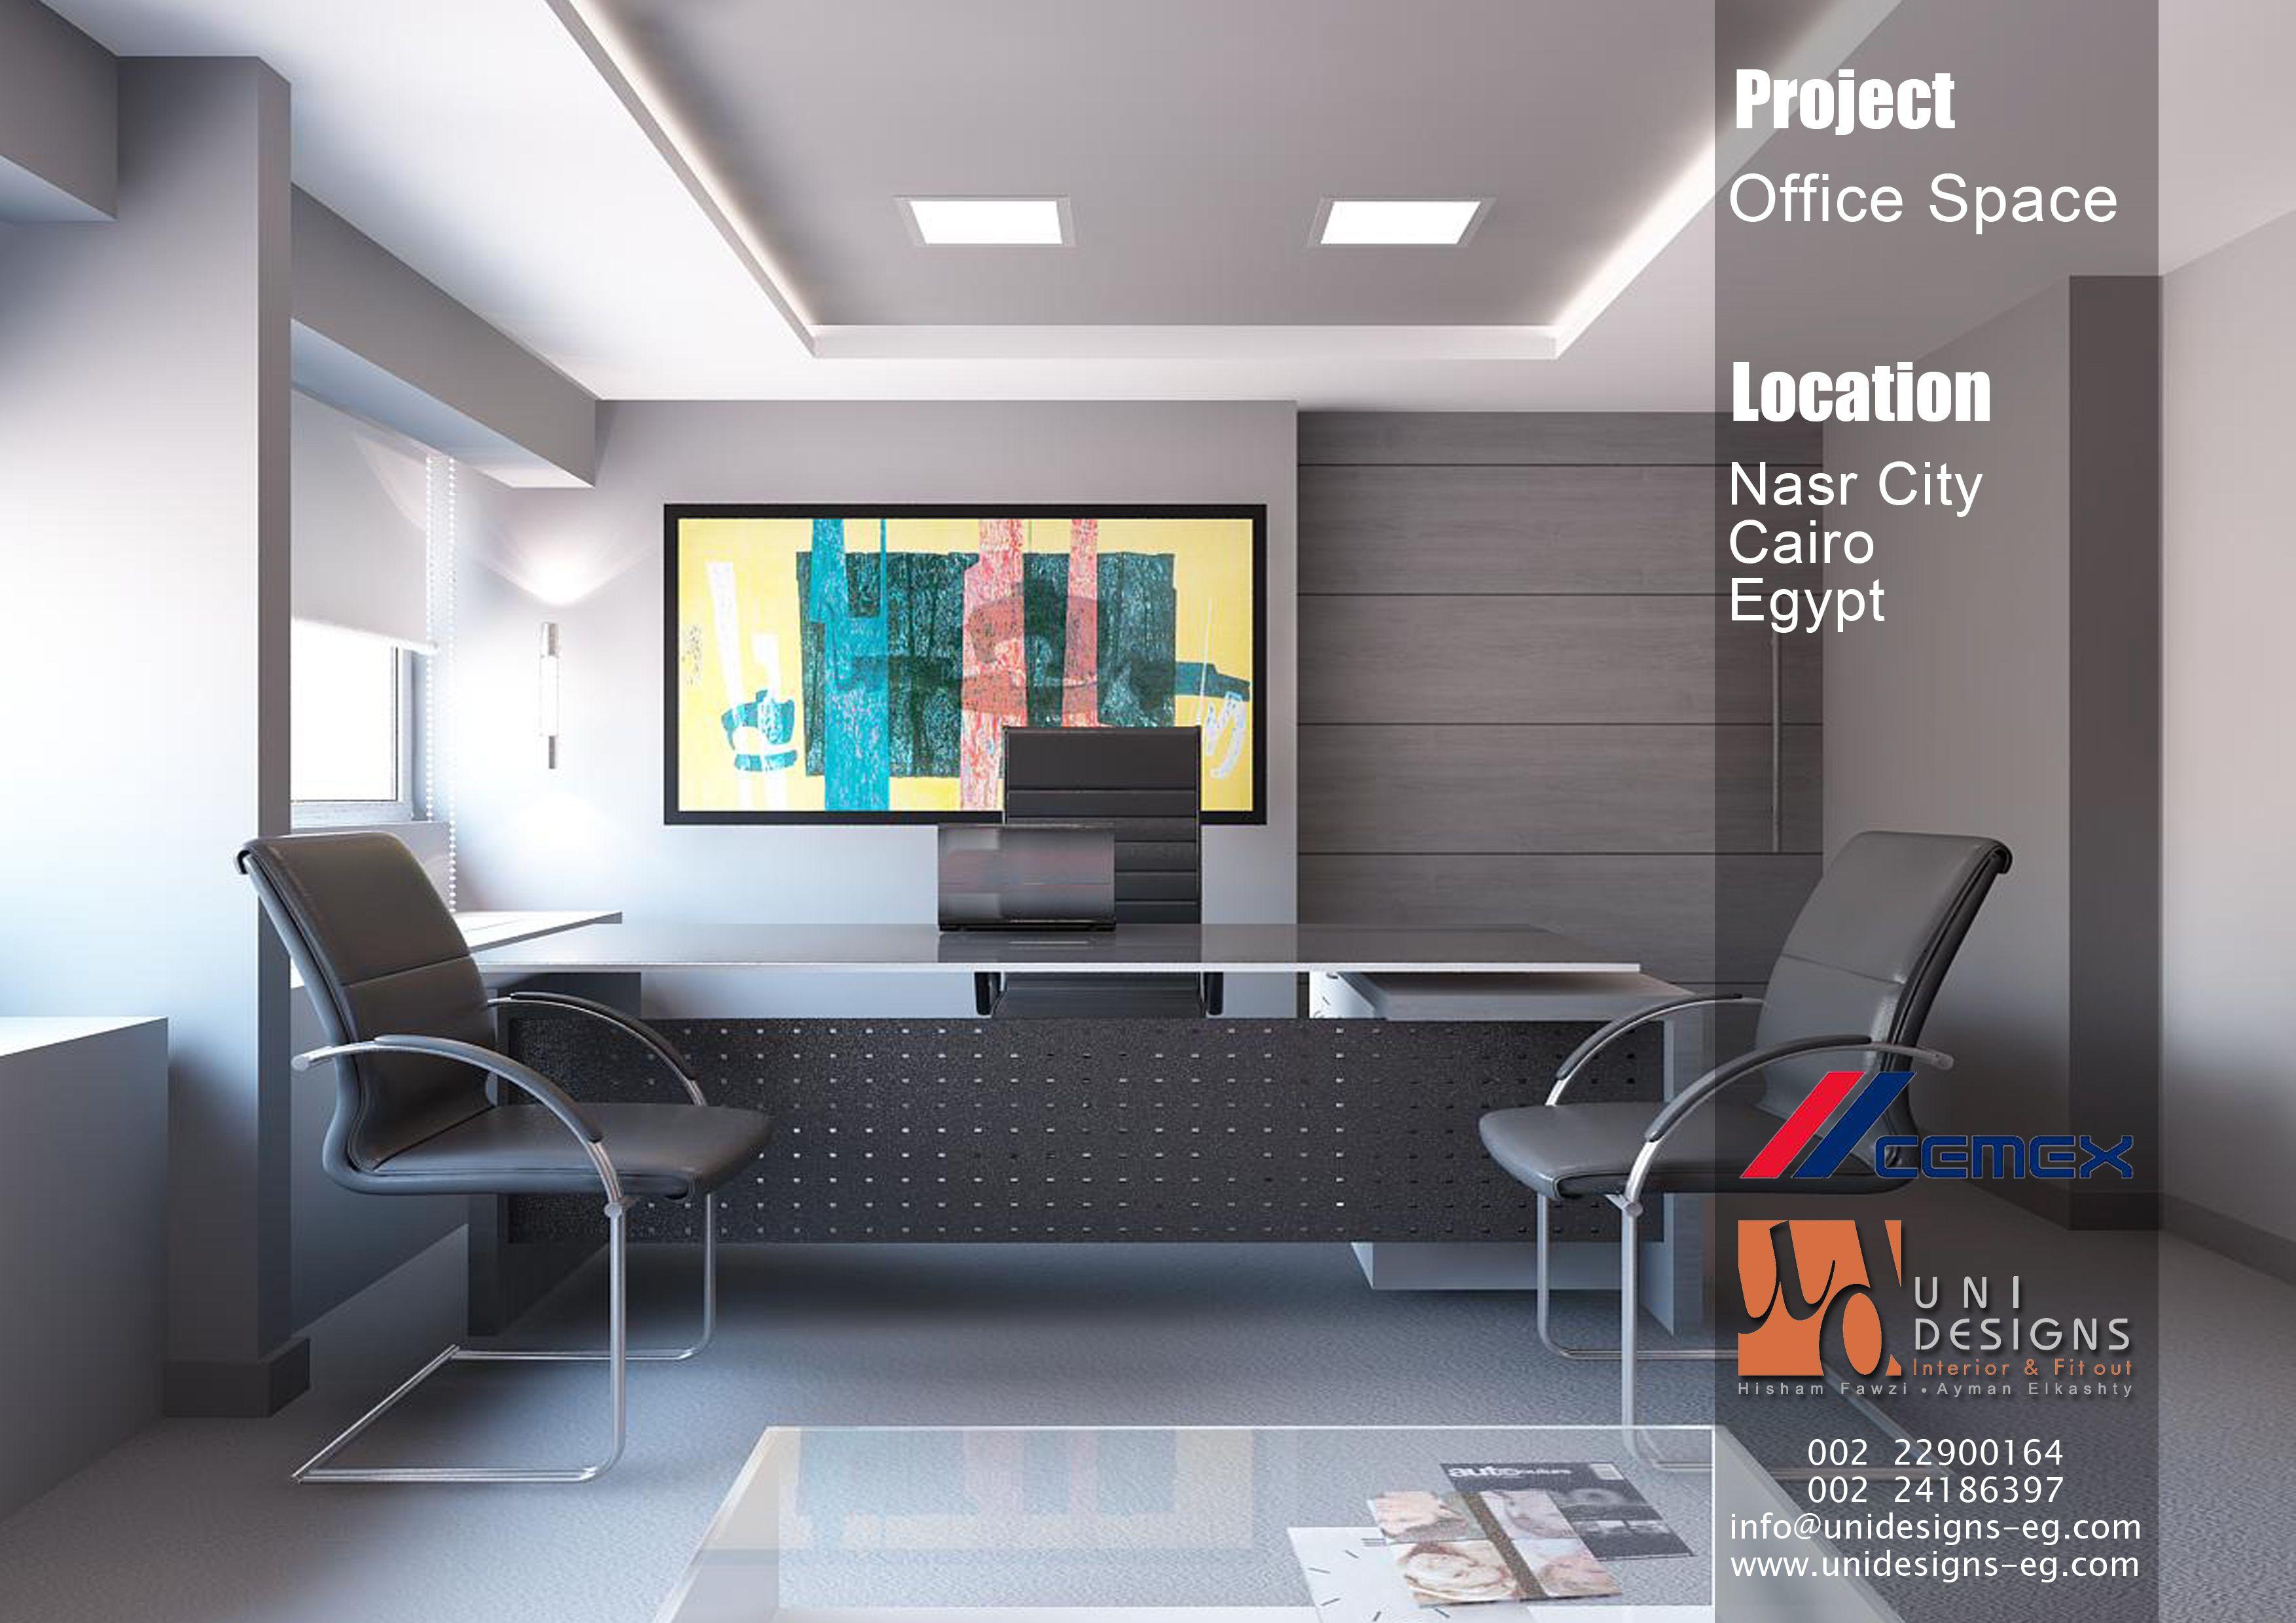 Designsartarchitecturedecoreideasprojectsofficespace